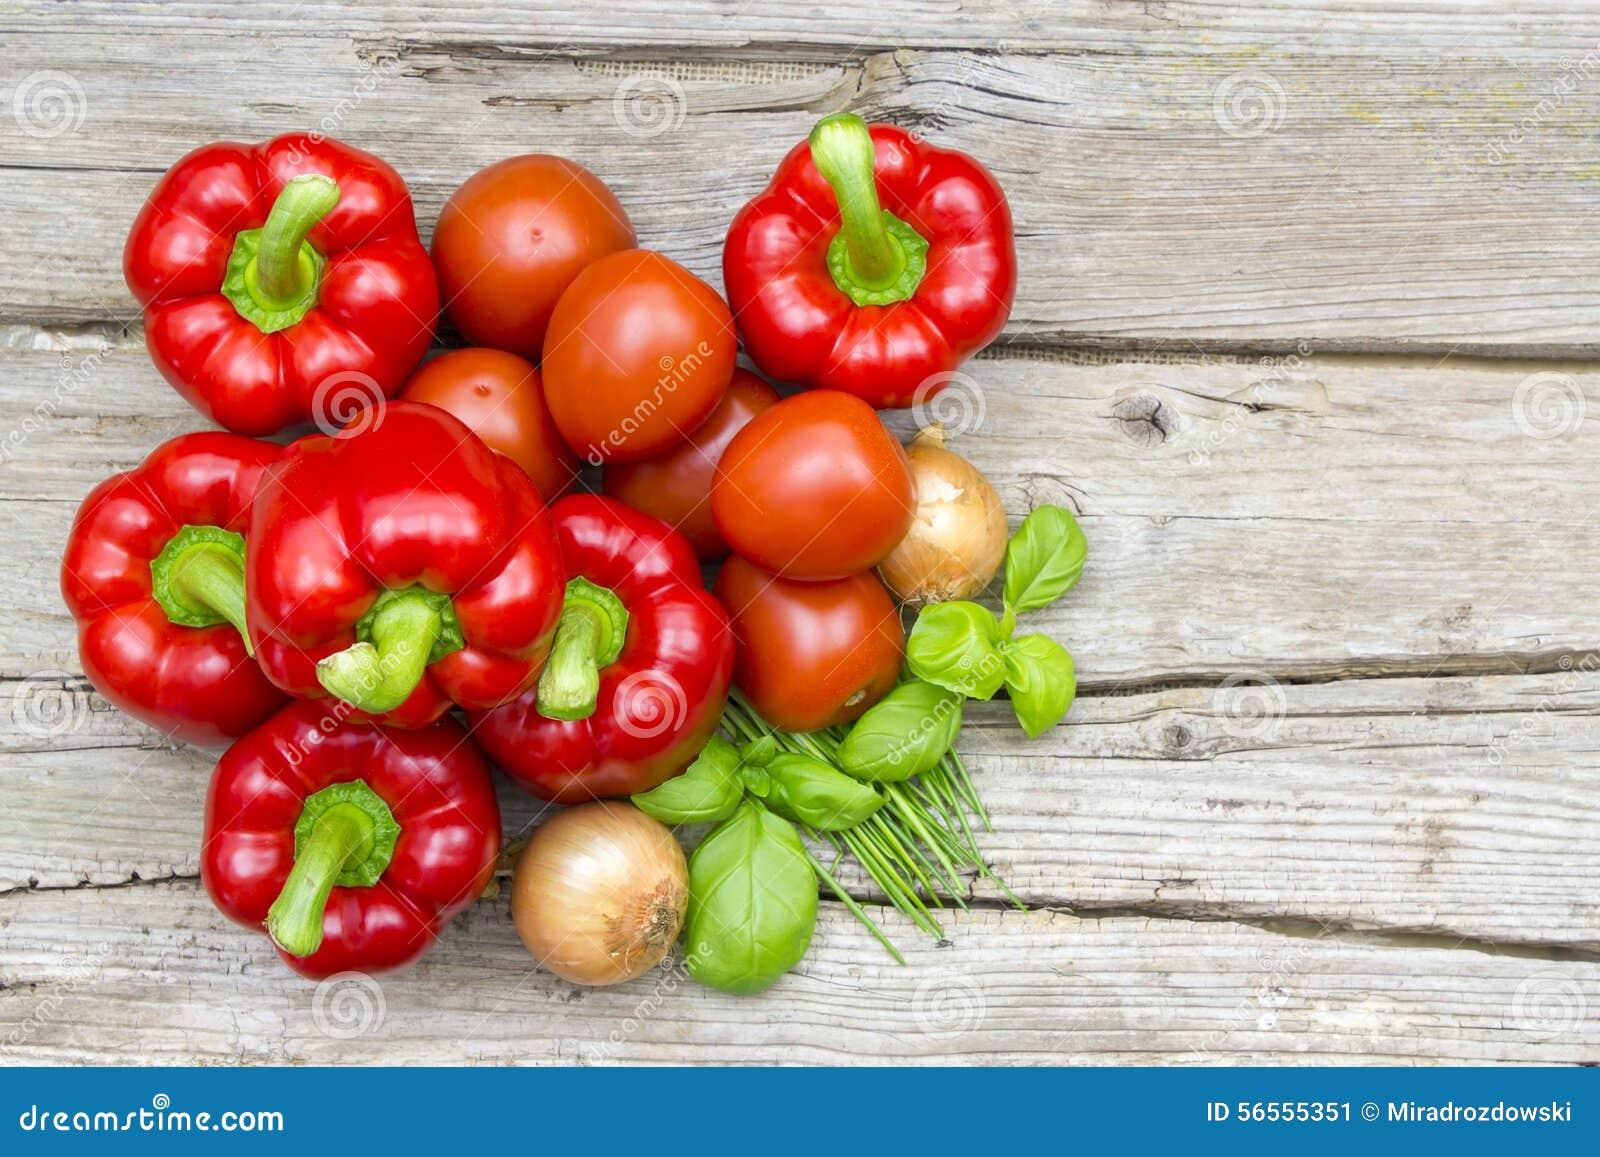 Download λαχανικά προϊόντων φρέσκιας αγοράς γεωργίας Στοκ Εικόνα - εικόνα από αγρόκτημα, κουζίνα: 56555351